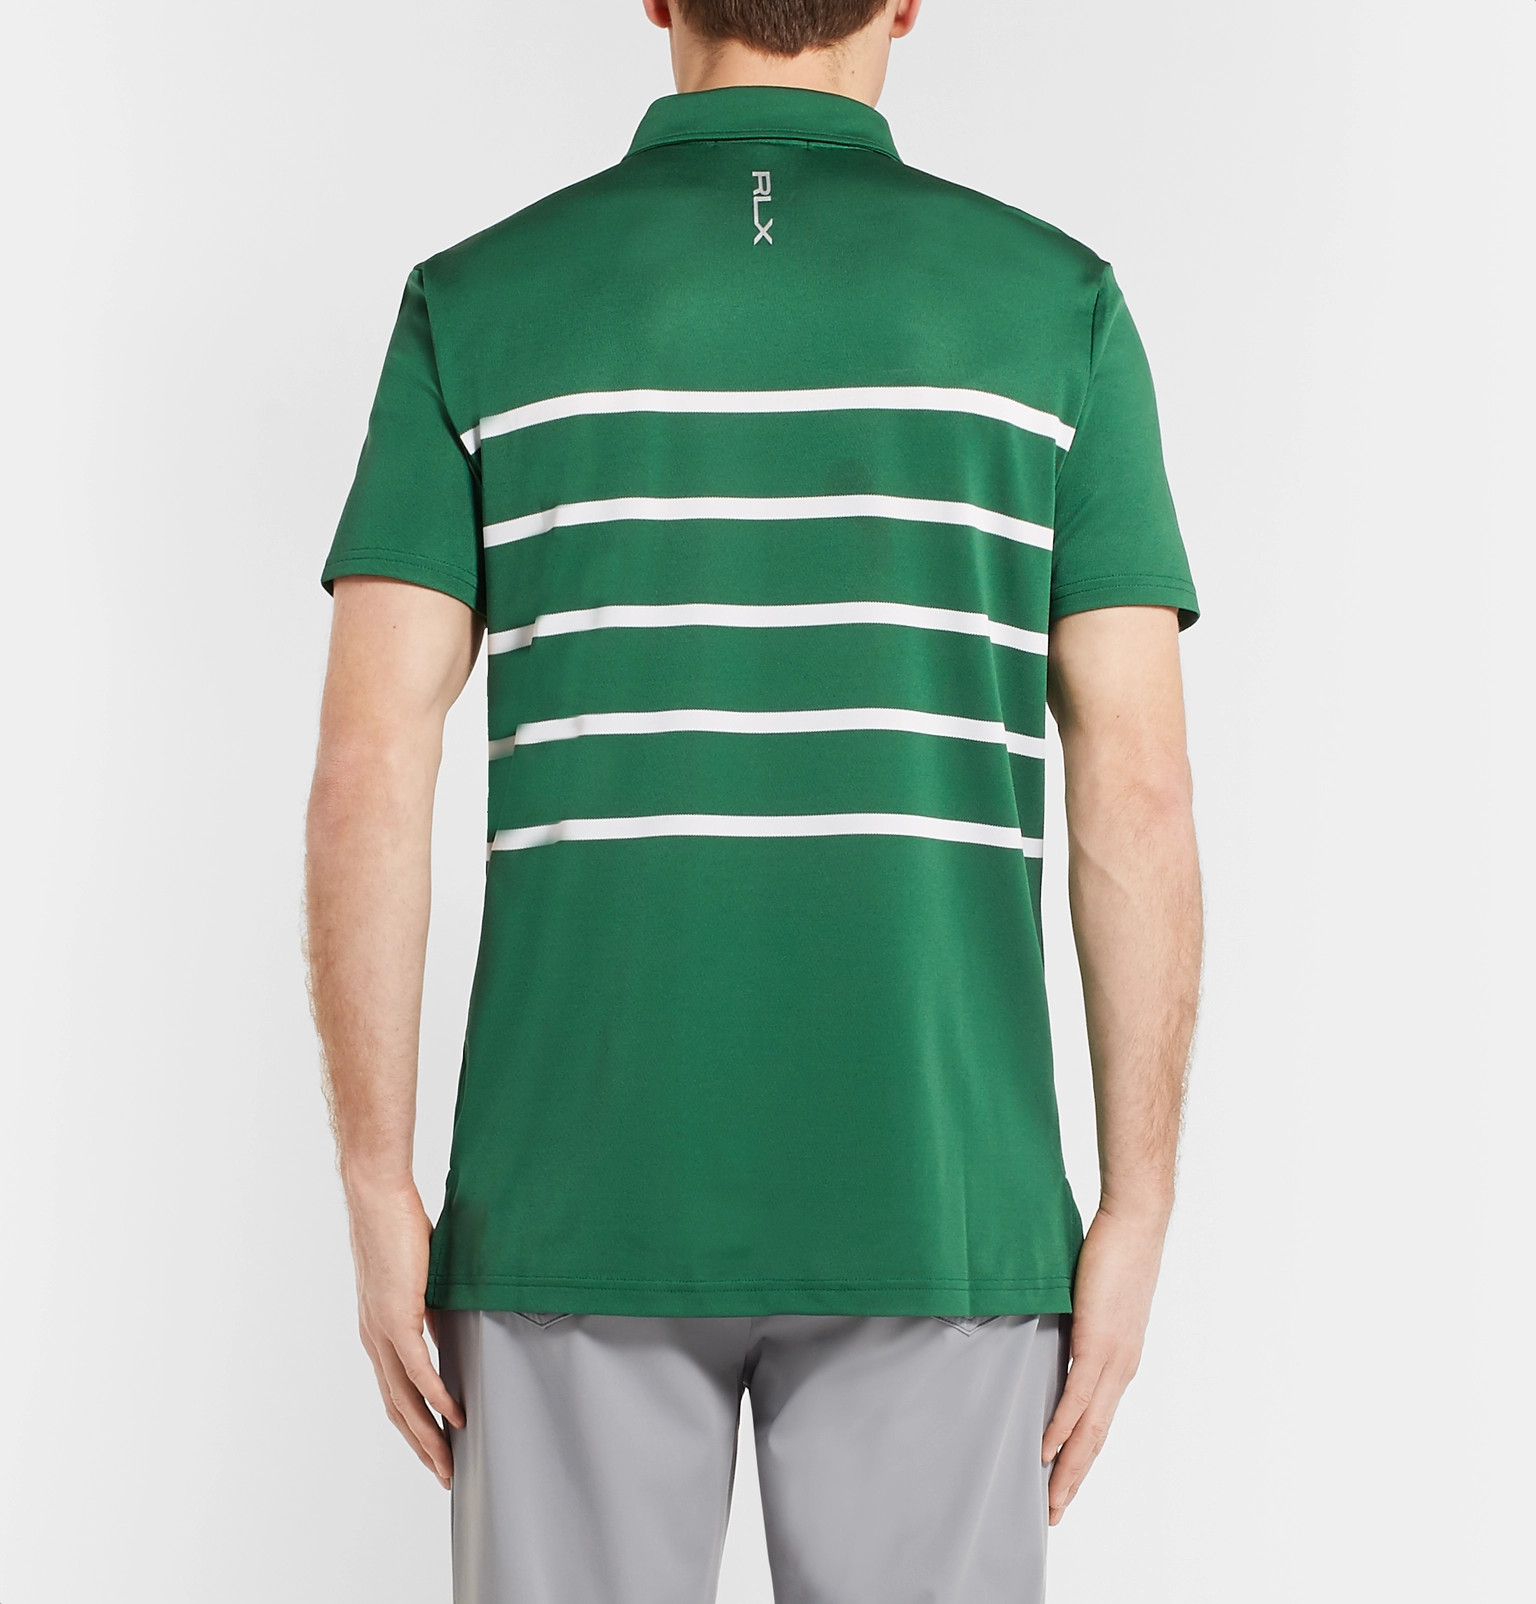 Rlx Ralph Lauren Striped Stretch Tech Piqu Polo Shirt